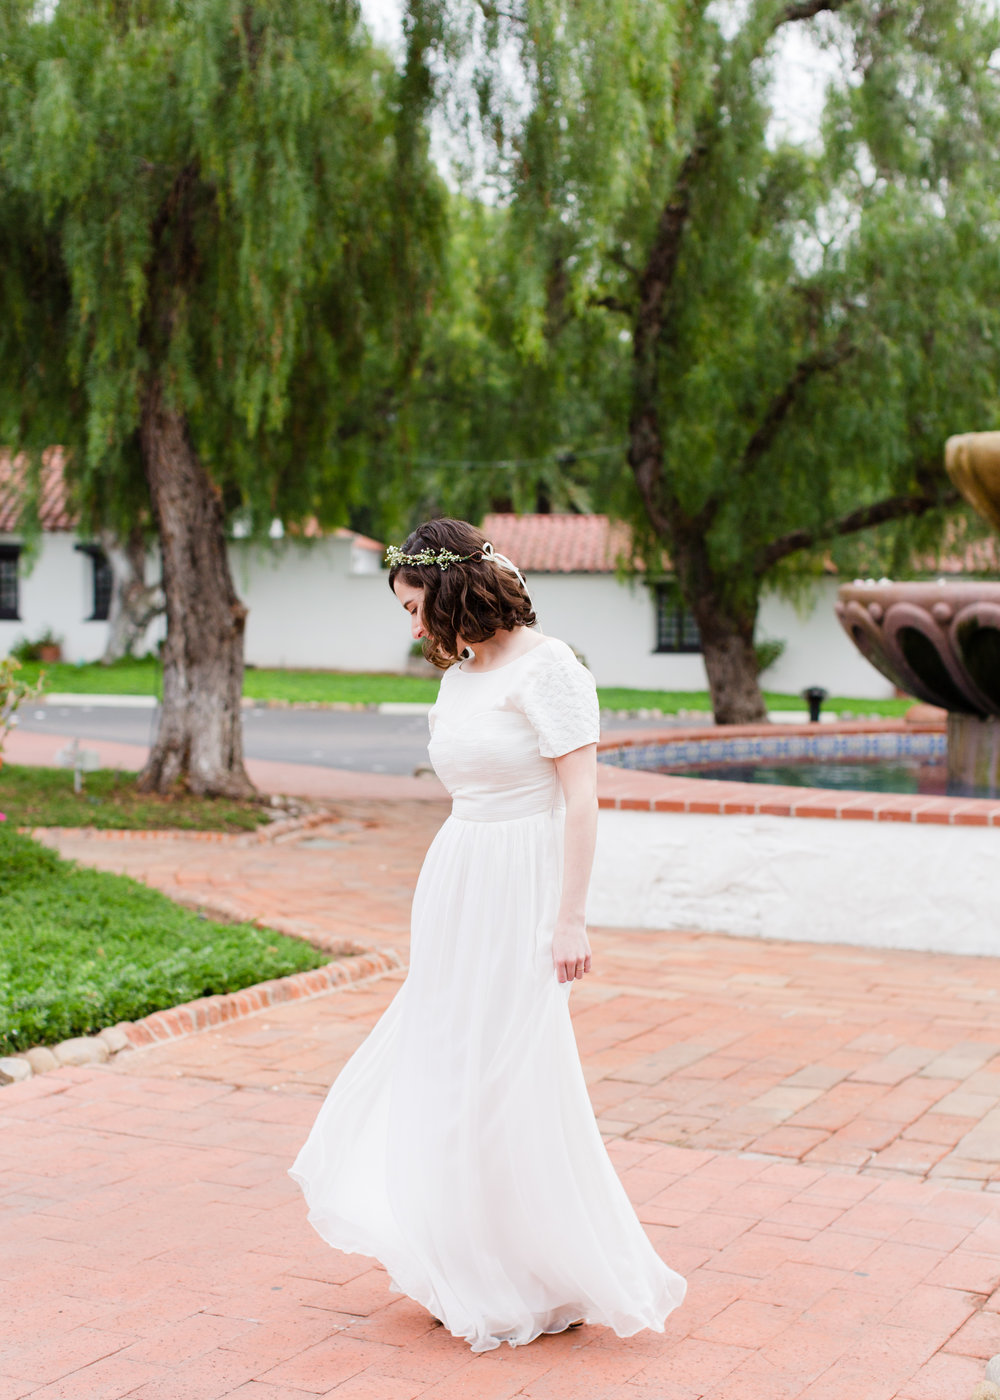 katherine_beth_photography_san_diego_photographer_San_diego_wedding_photographer_san_diego_mission_040.jpg